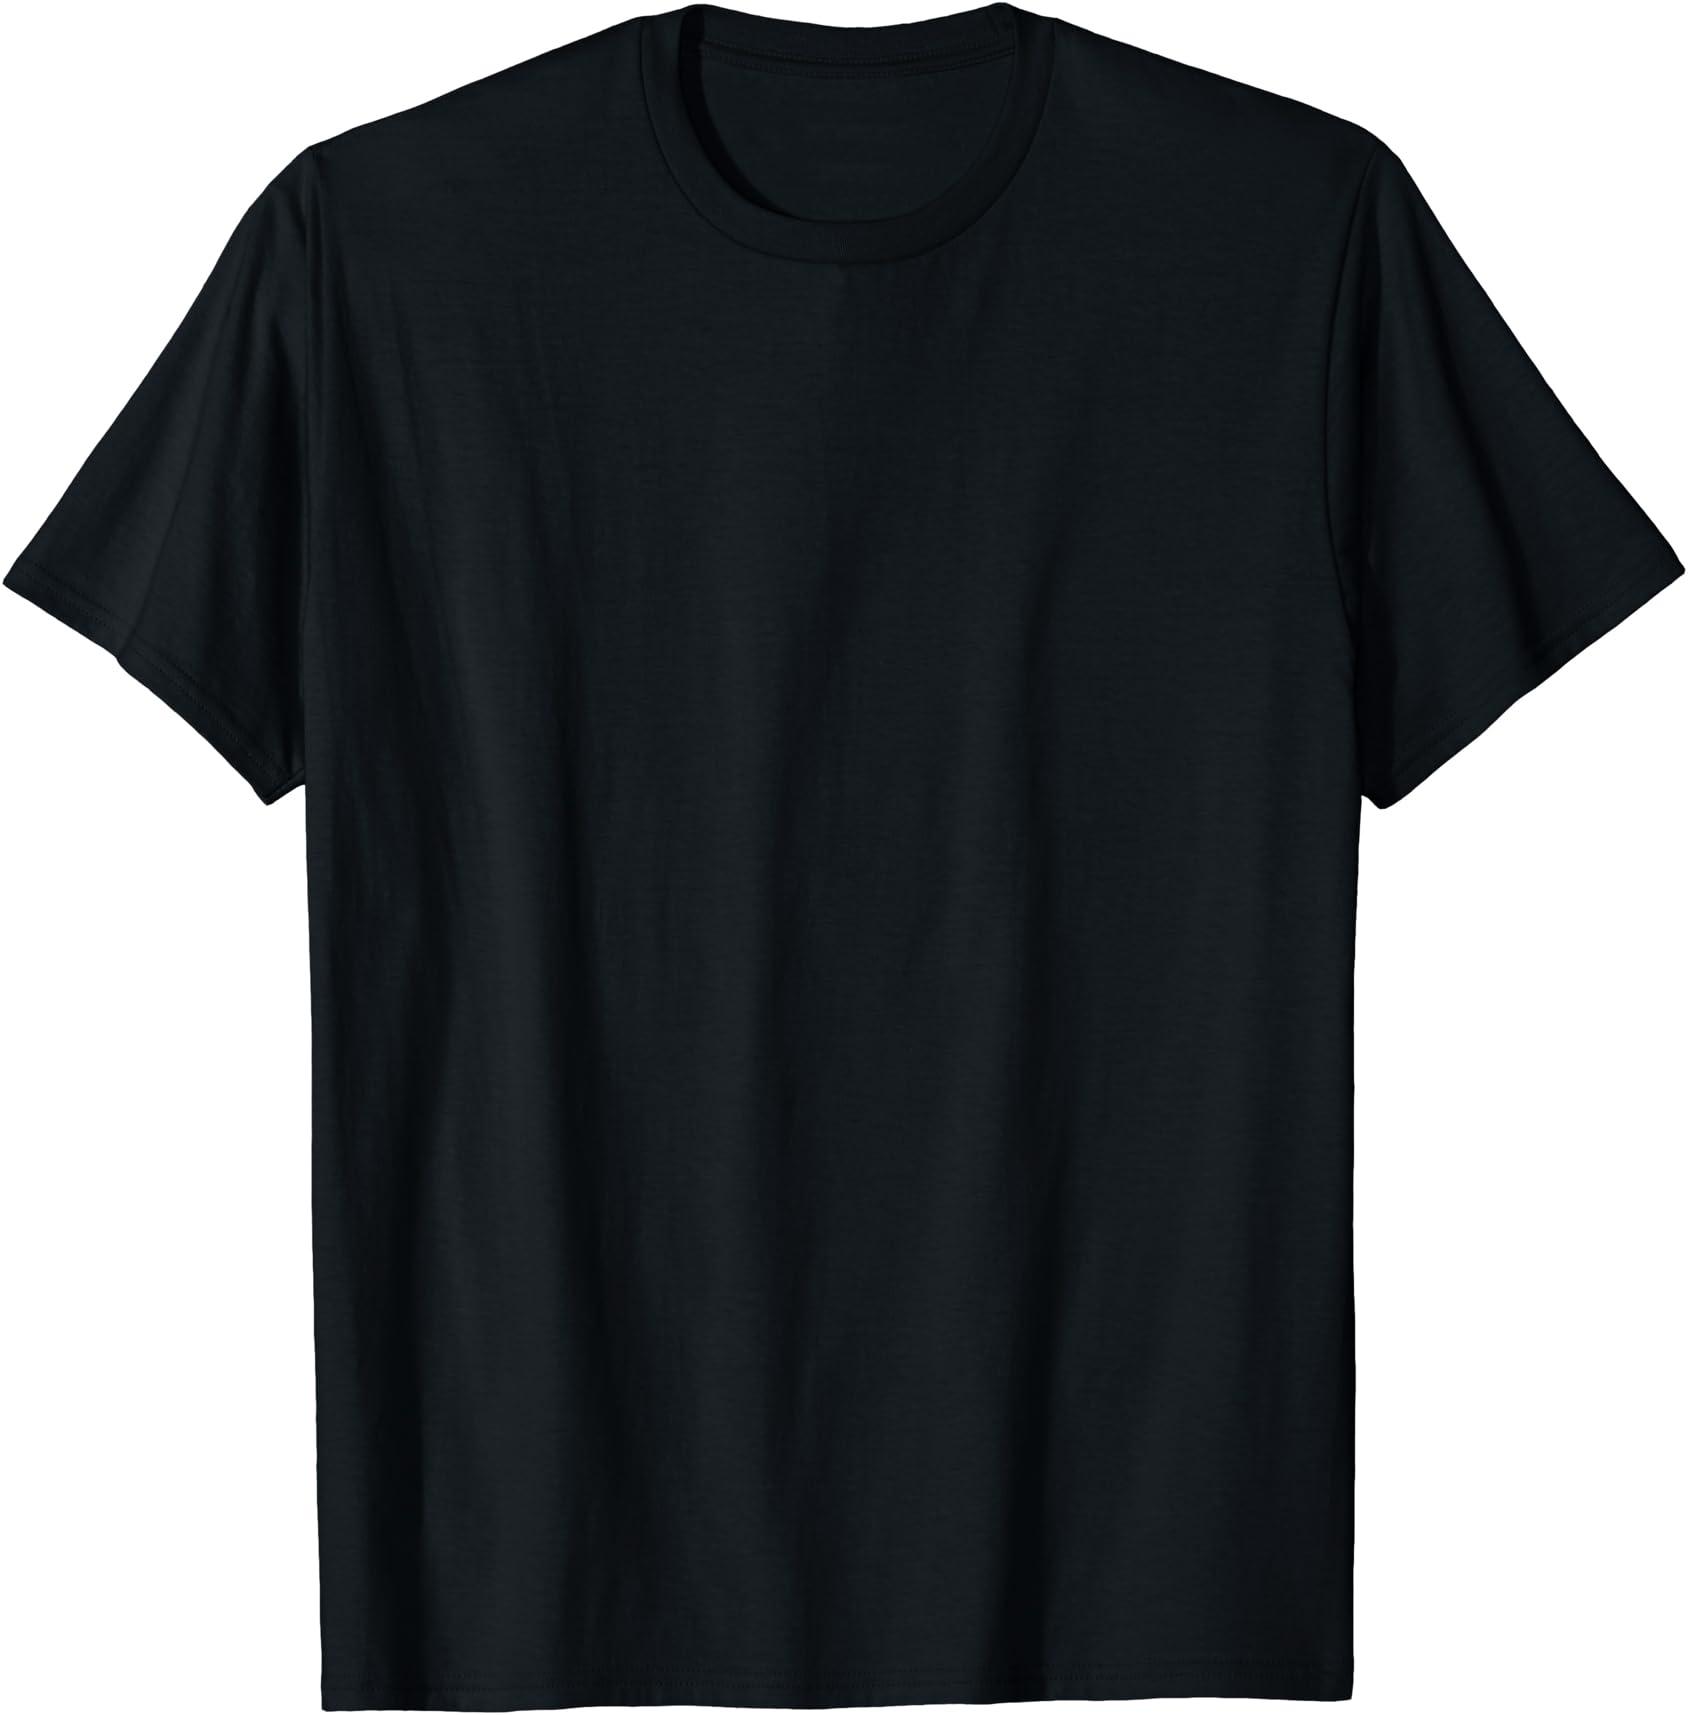 Funny T-Shirt Beer O/'Clock Regular Fit 100/% Cotton Tee